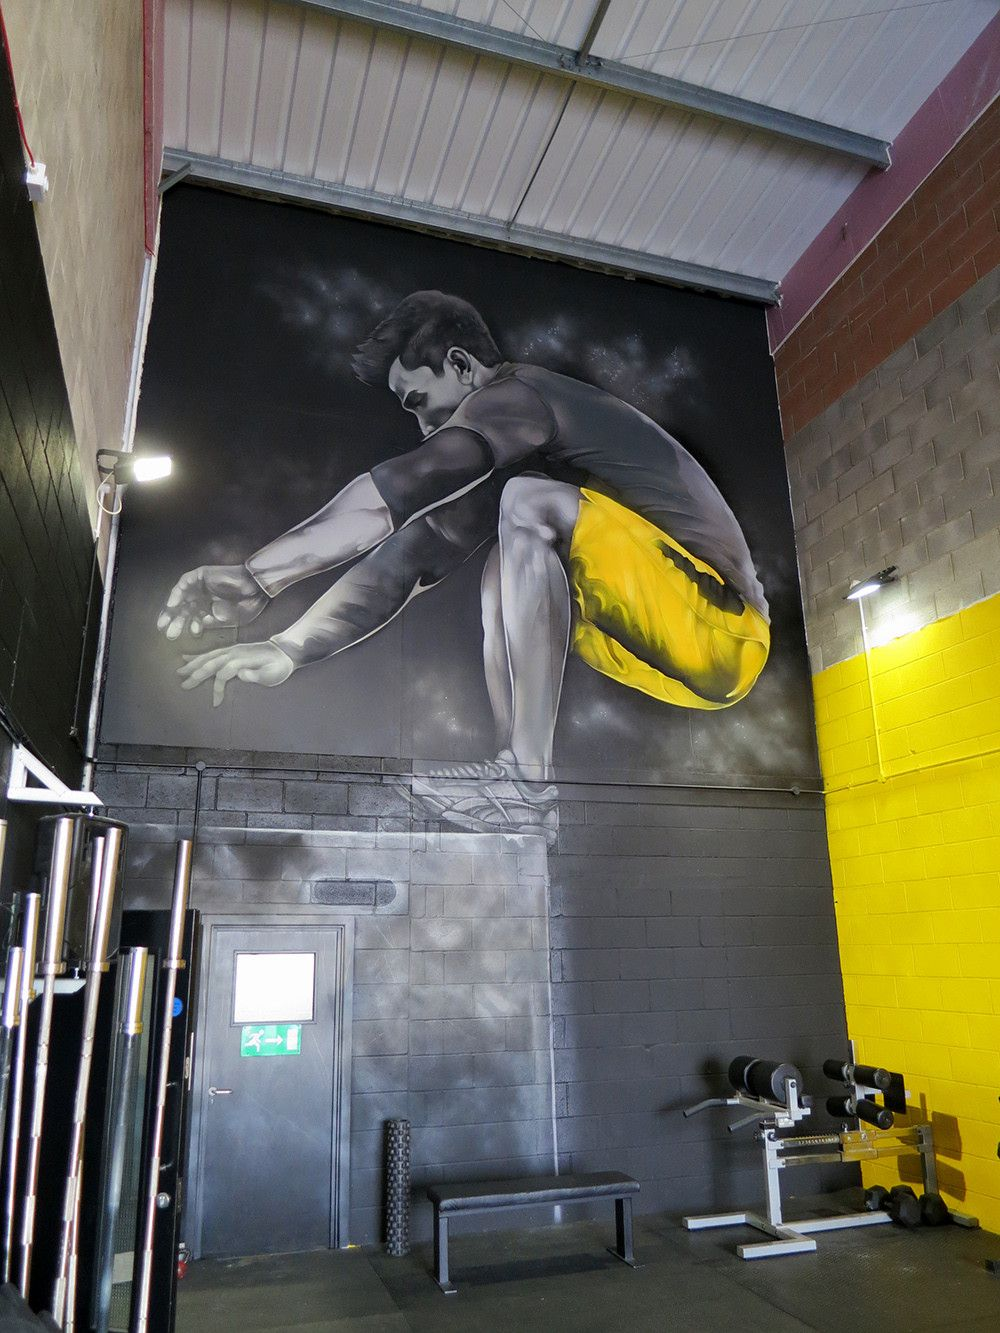 Sosathleticexcellence gym mural cardiff graffiti jmtt